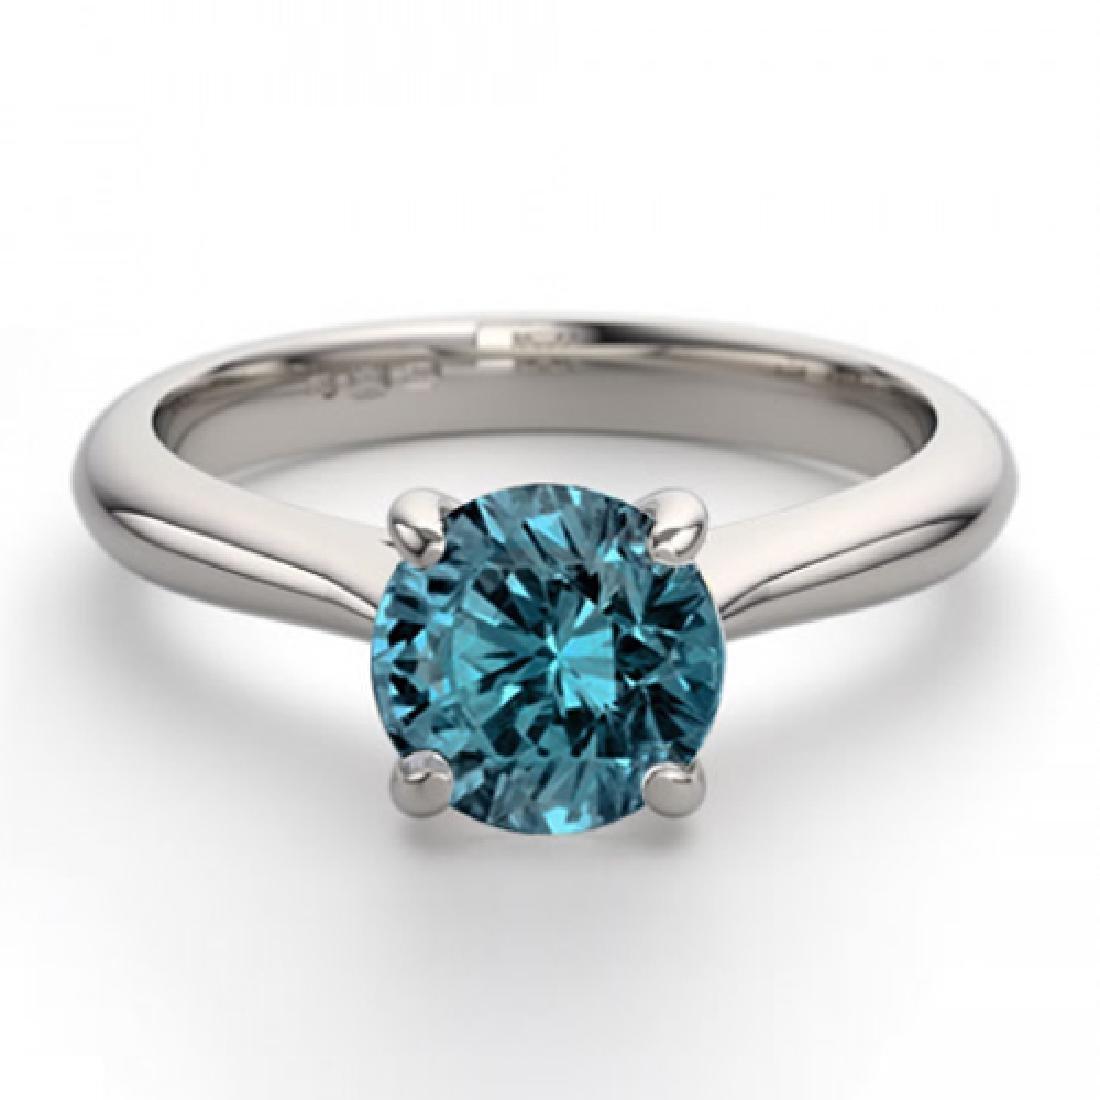 14K White Gold 1.41 ctw Blue Diamond Solitaire Ring -